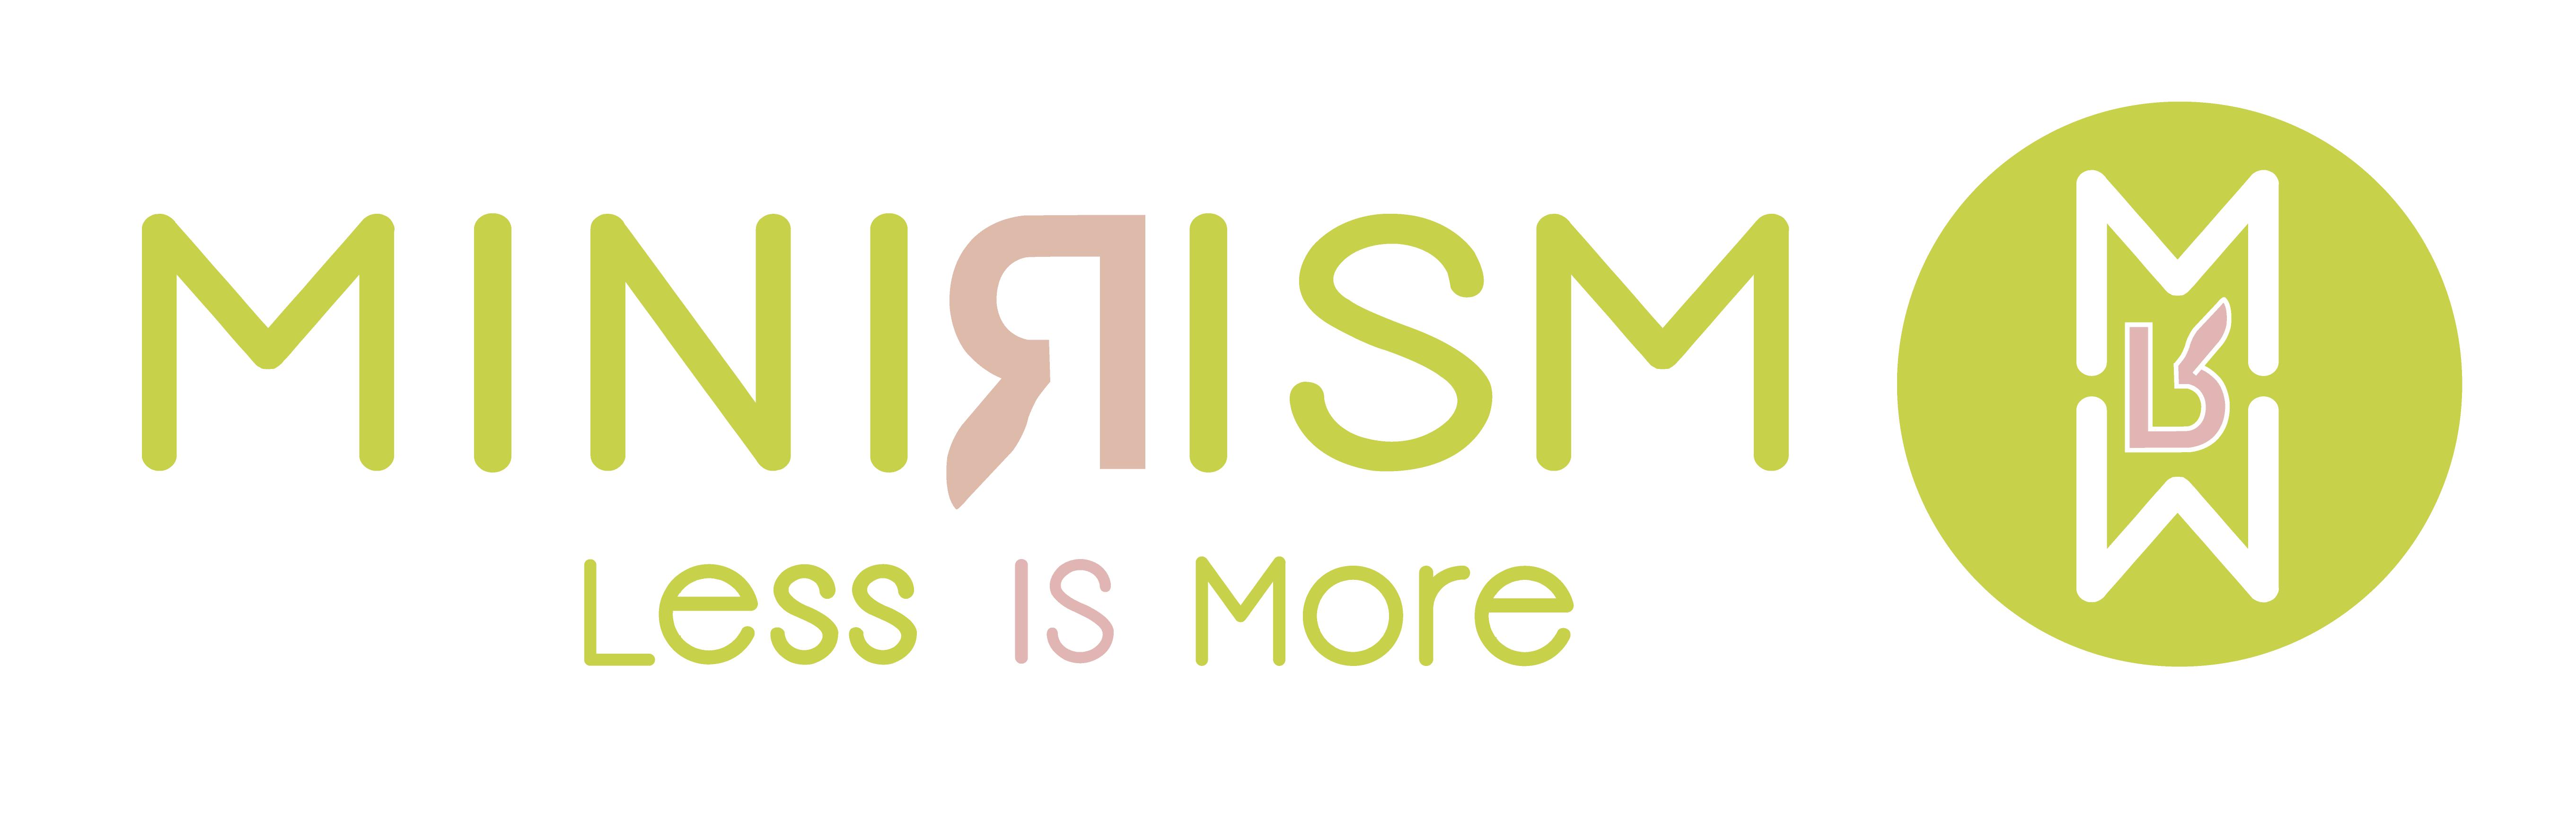 MINIЯISM